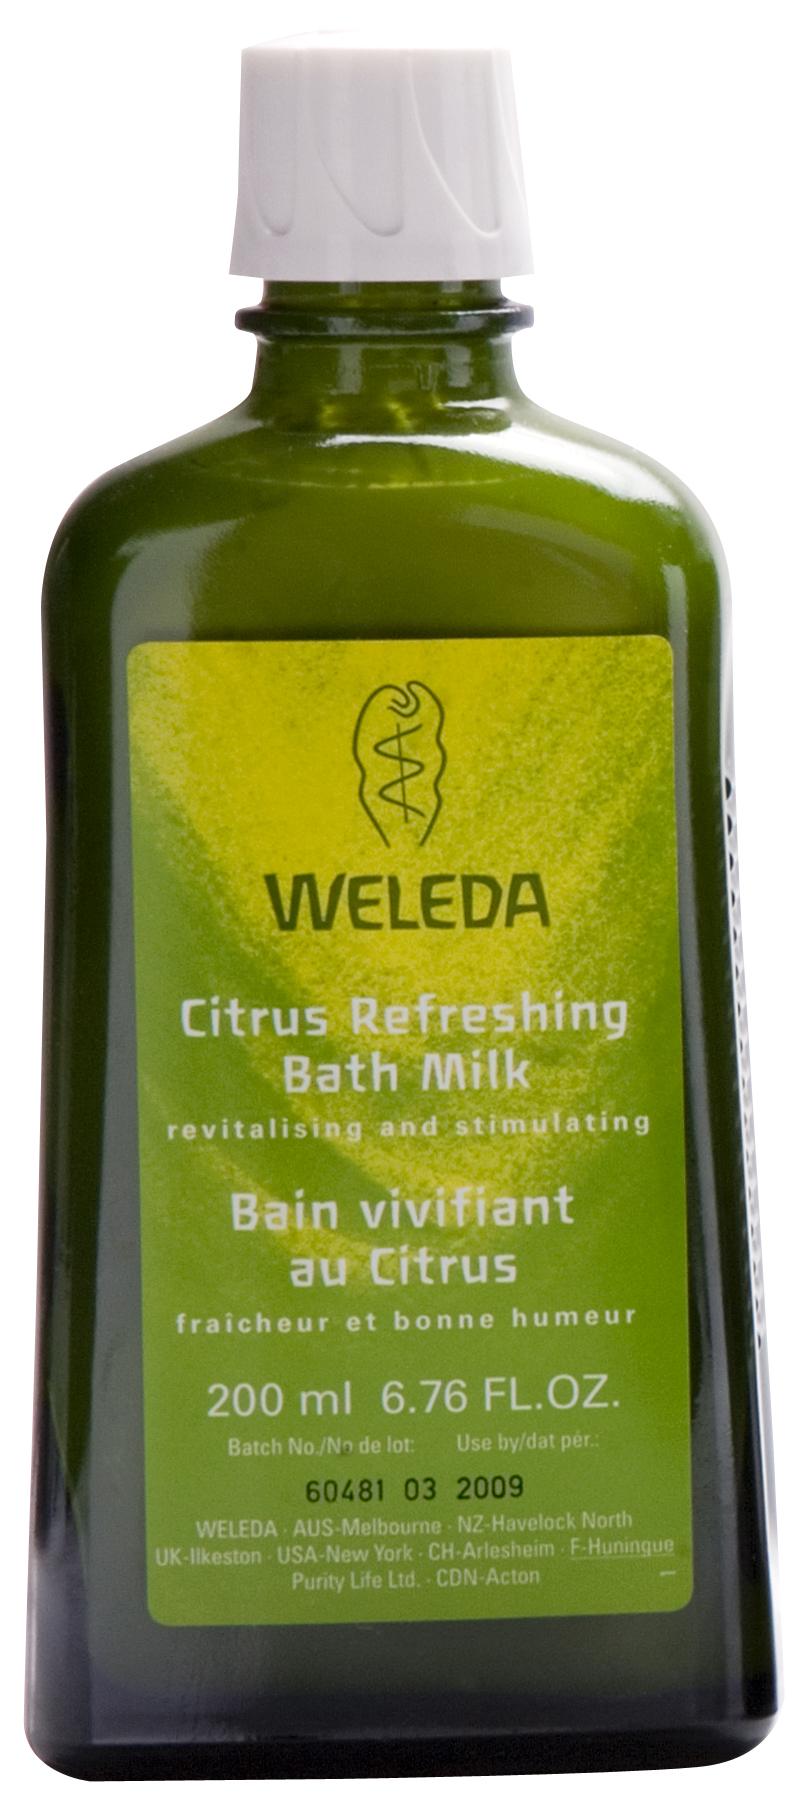 Weleda Citrus Bath Milk